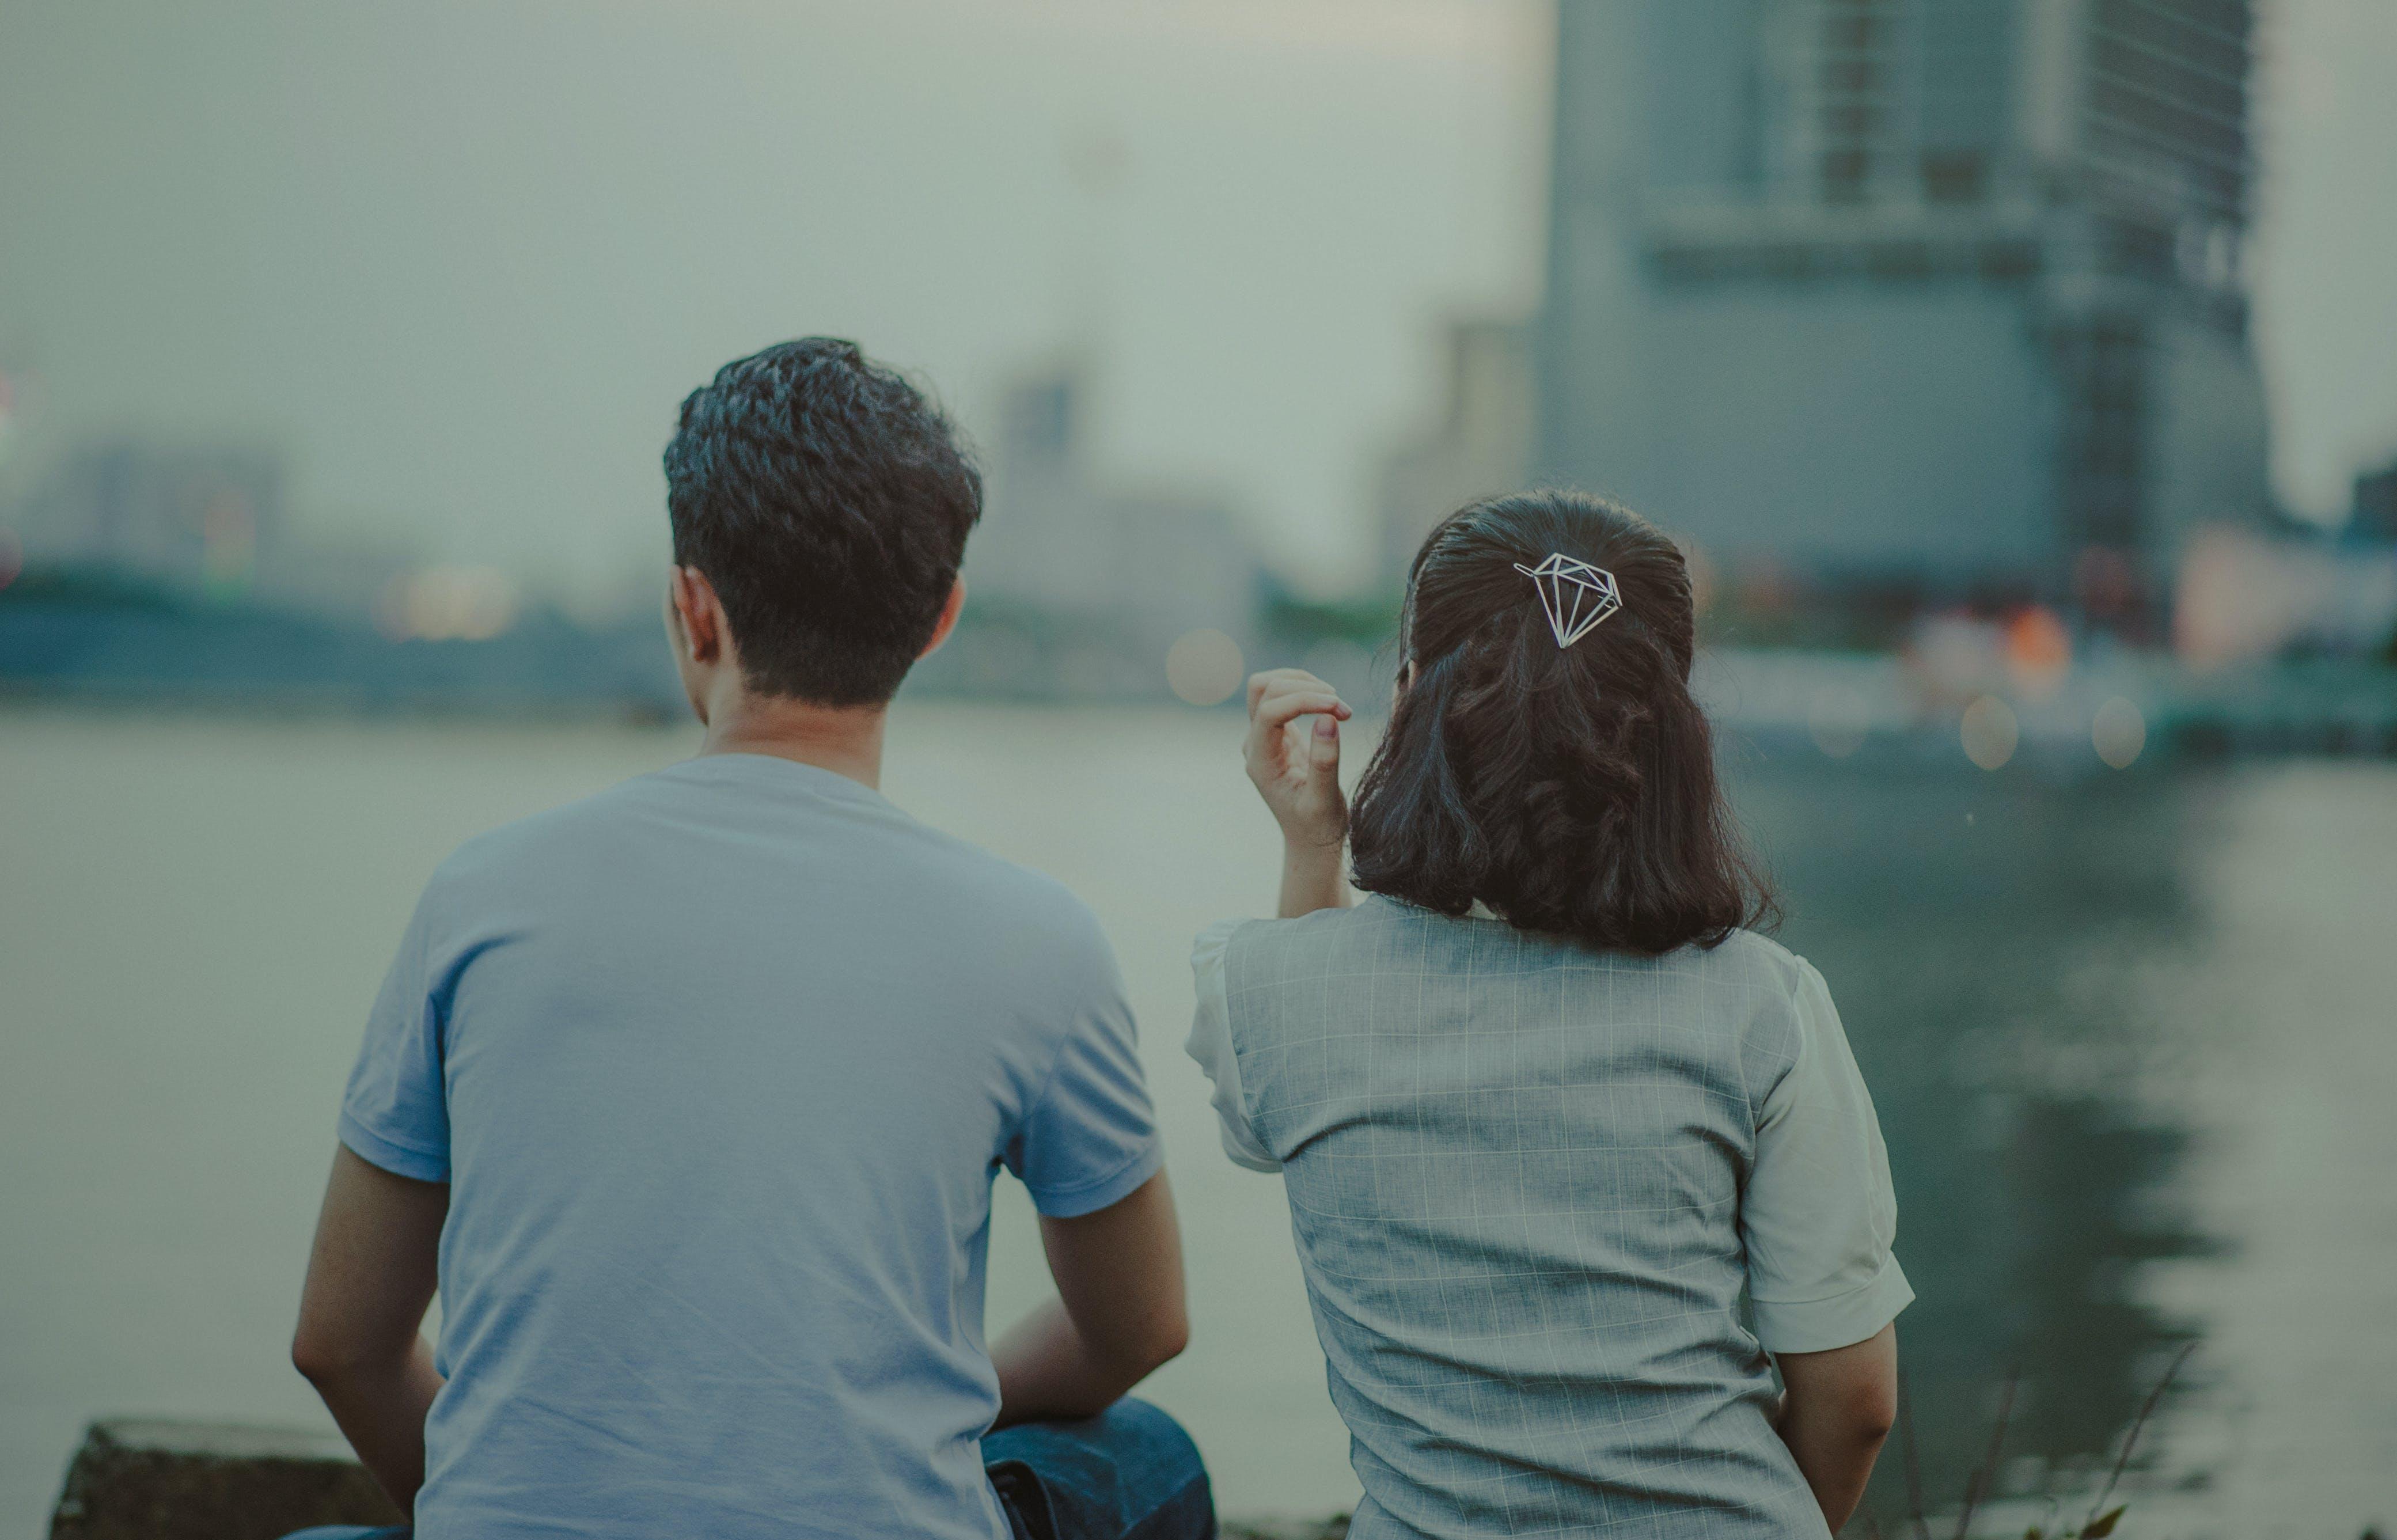 Man and Woman Wearing Shirt Facing Body of Water